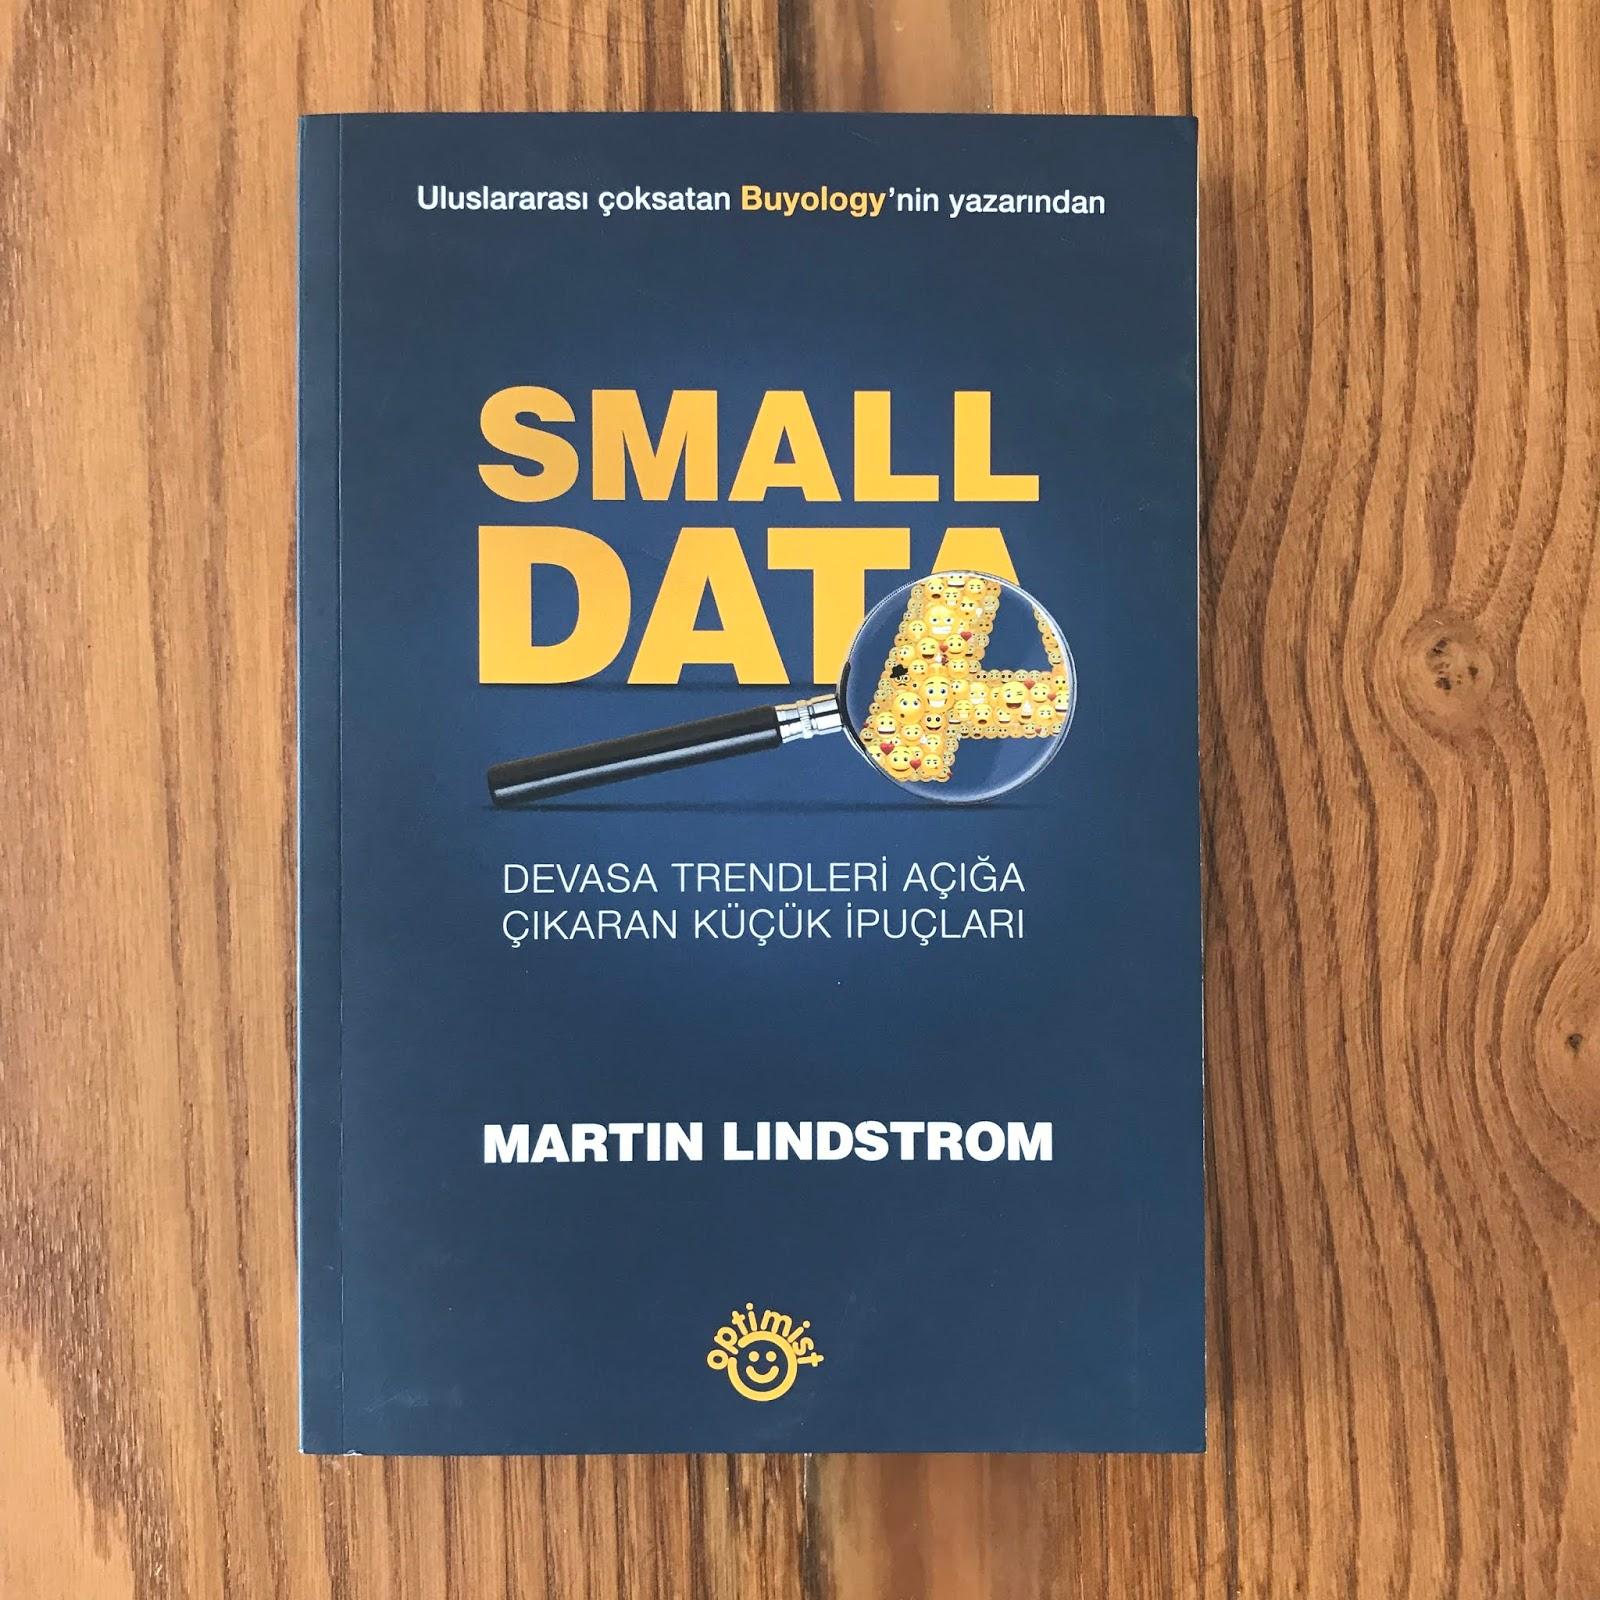 Small Data - Devasa Trendleri Aciga Cikaran Kucuk Ipuclari (Kitap)